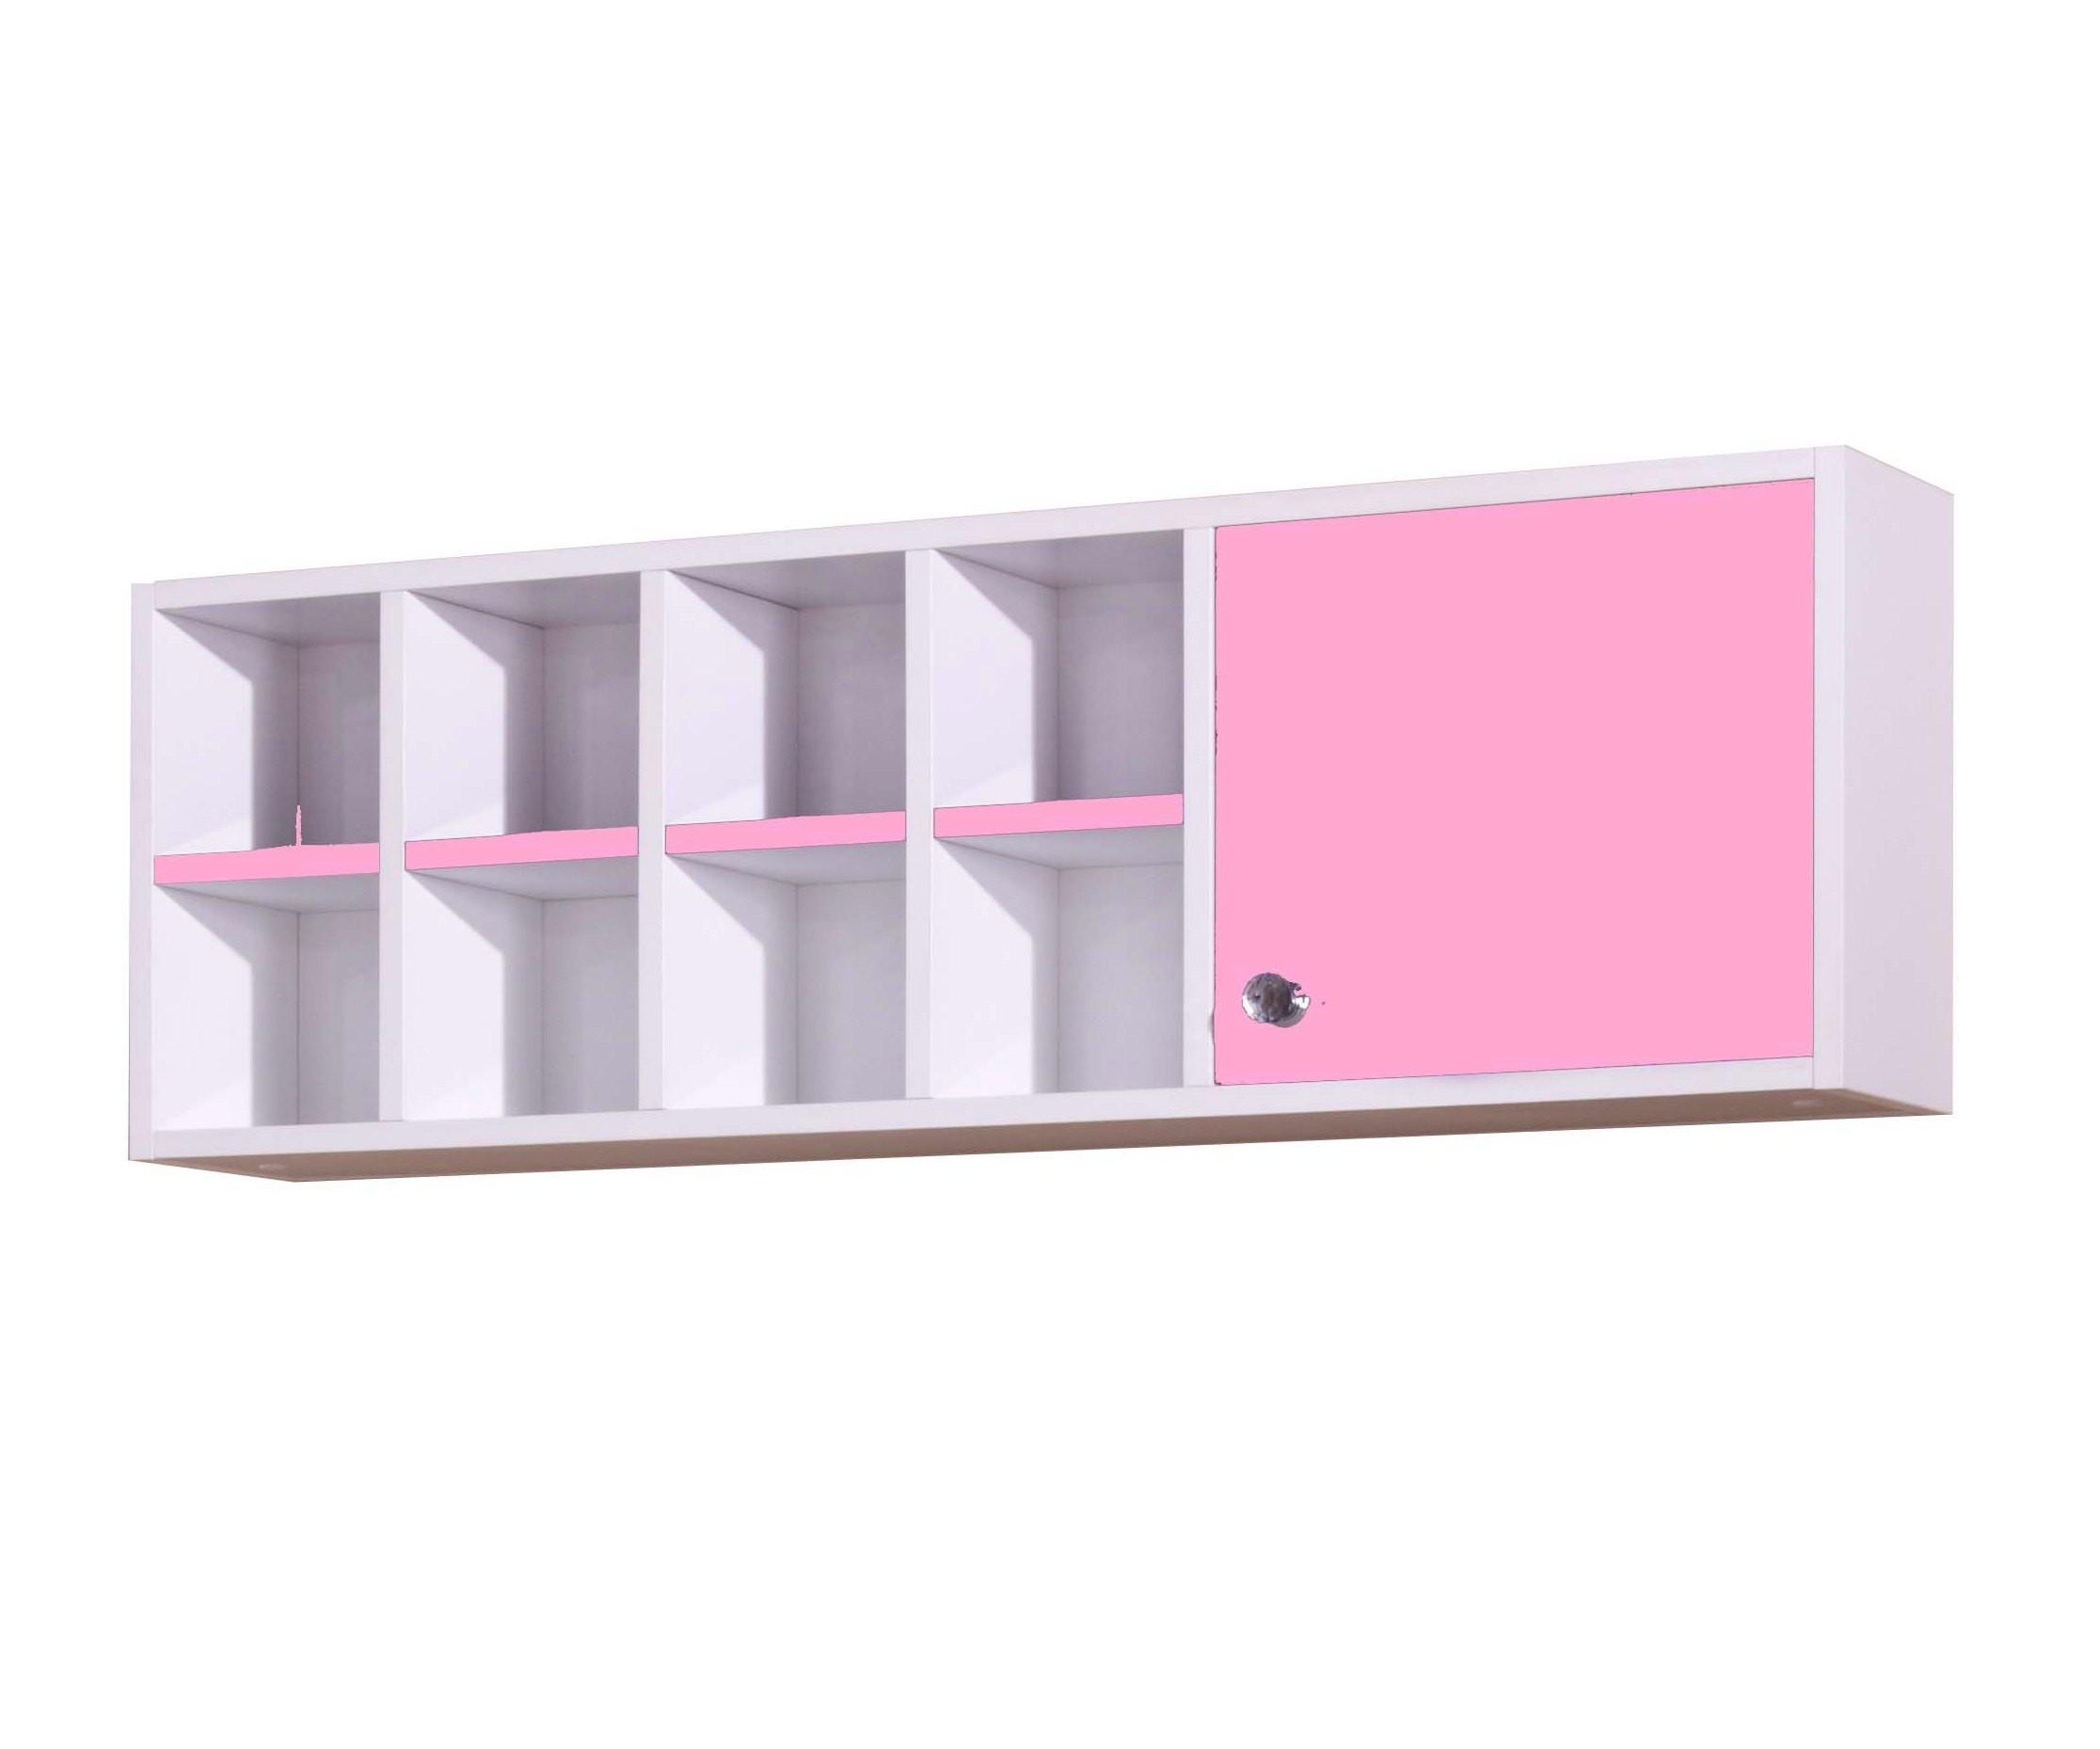 Prinses wandkast meisjeskamer roze kinderkamer kinderbed terrashaard en barbecues - Roze kinderkamer ...